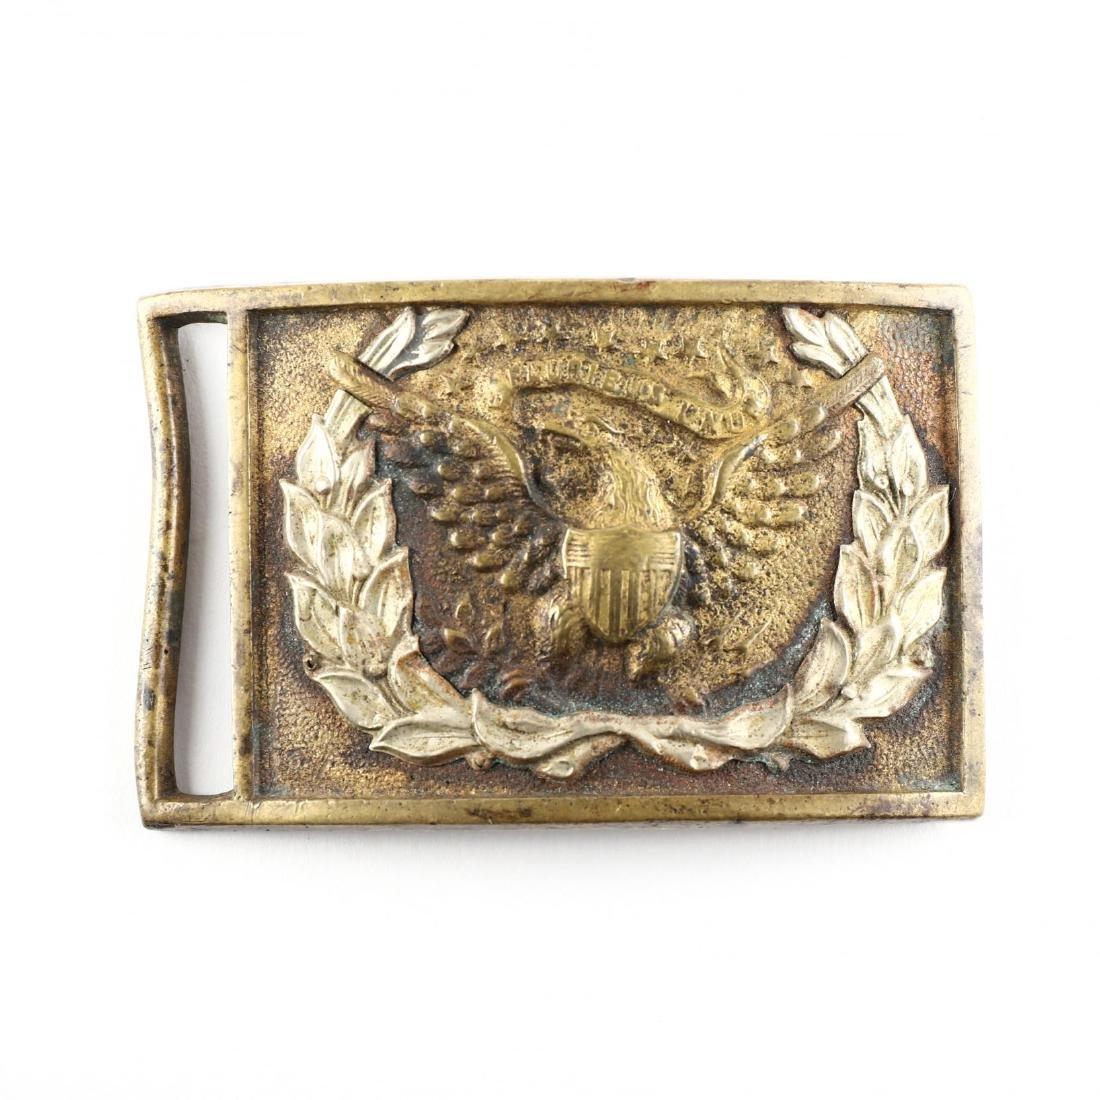 Regulation 1851 Pattern U. S. Army Belt Plate - 3